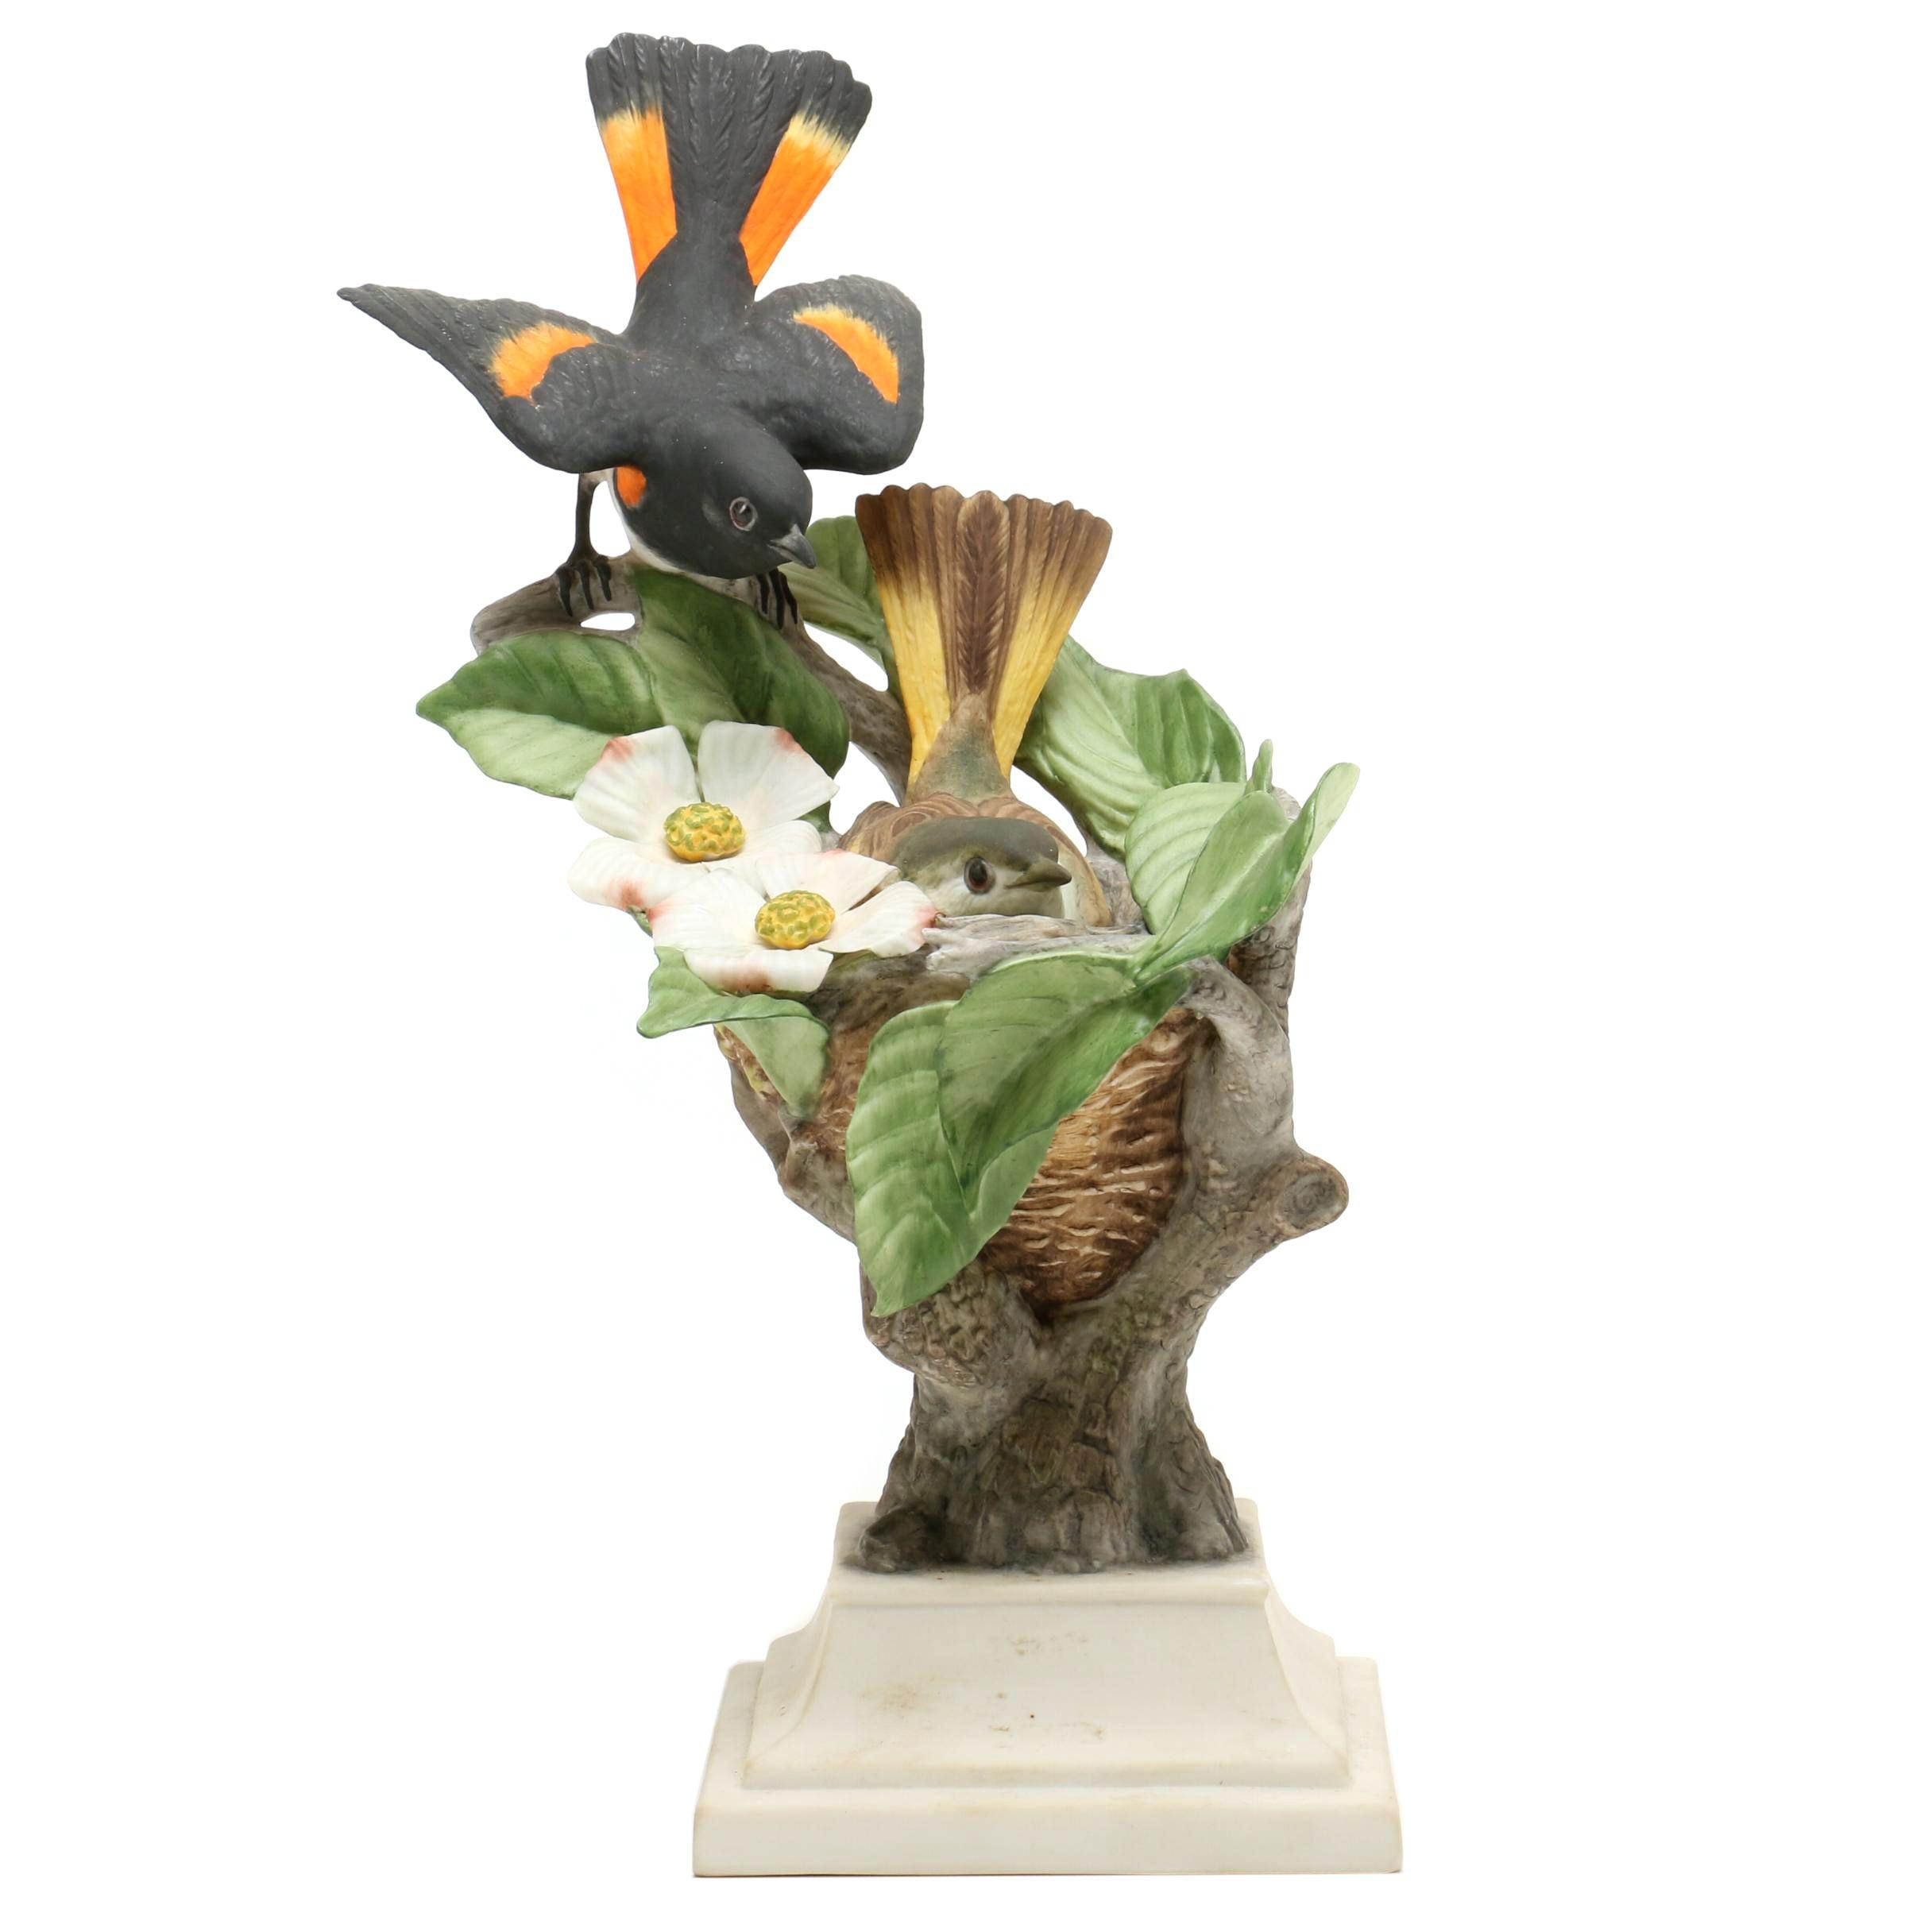 Limited Edition Boehm Sculpture of Oriole Birds